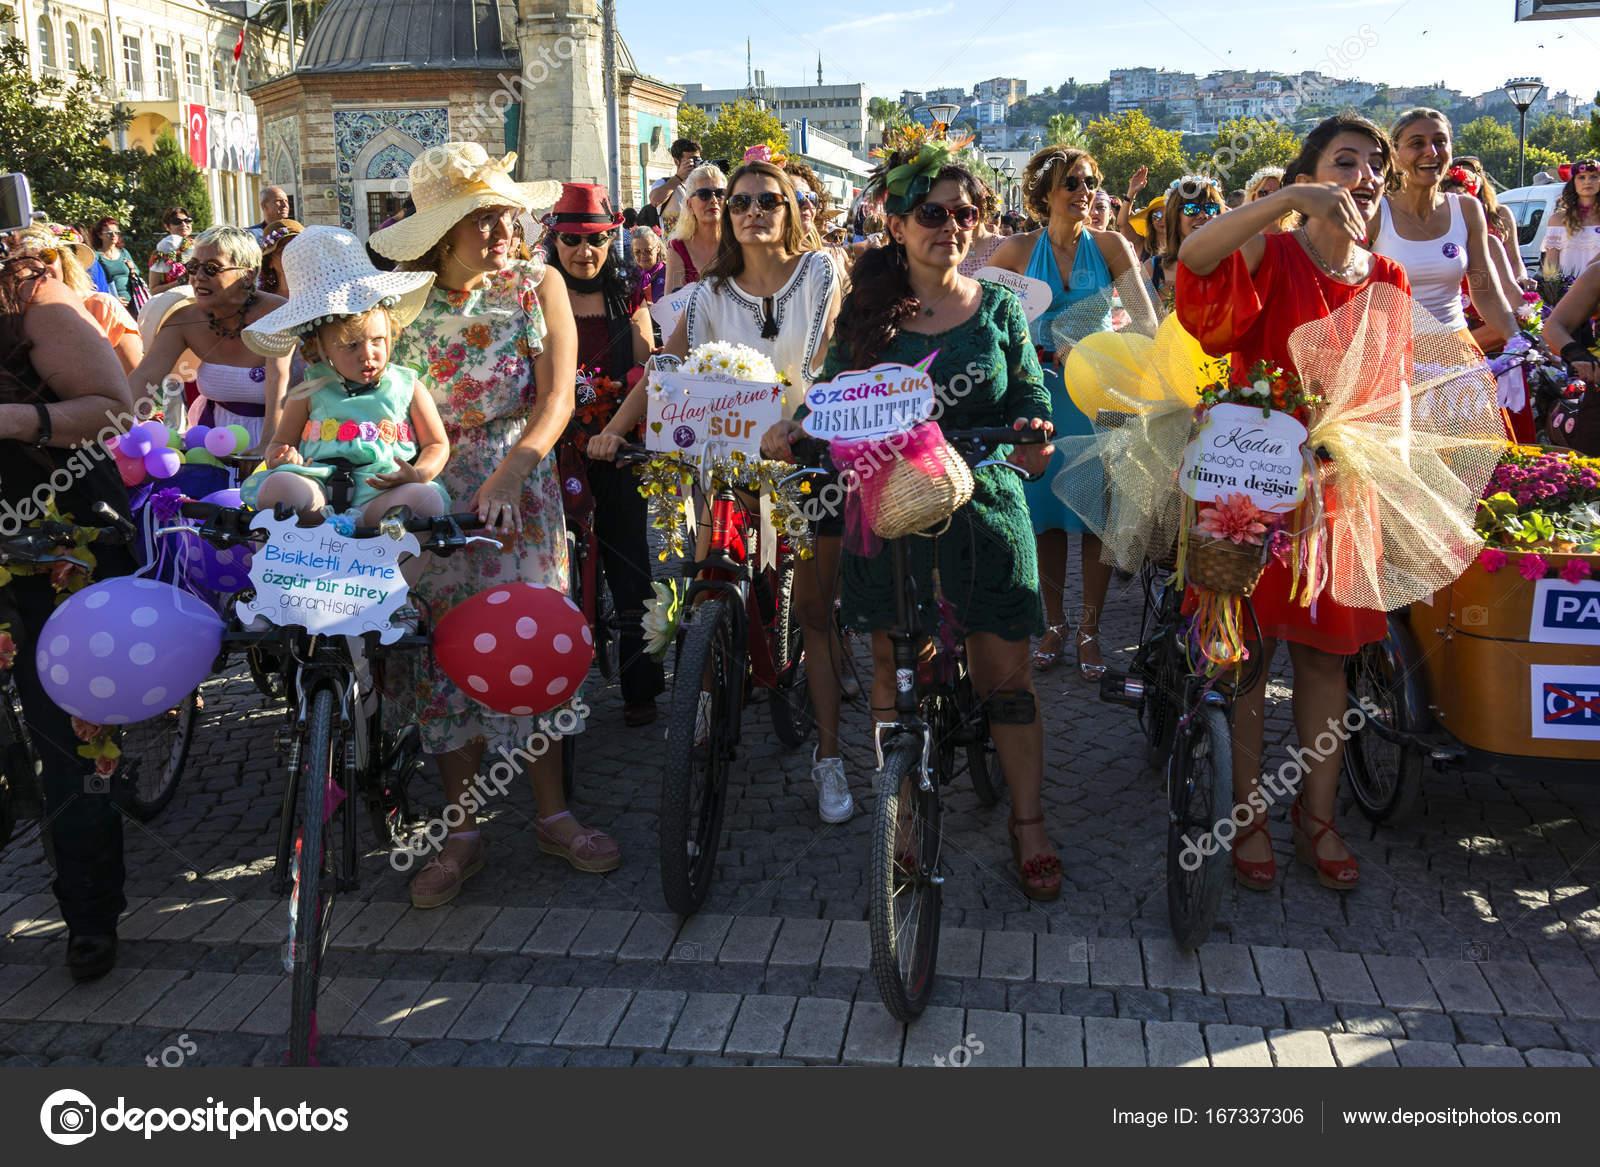 09 24 2017 Konak Izmir Turkey Izmir Fancy Women Cycling Festival Stock Editorial Photo C Muratti6868 167337306